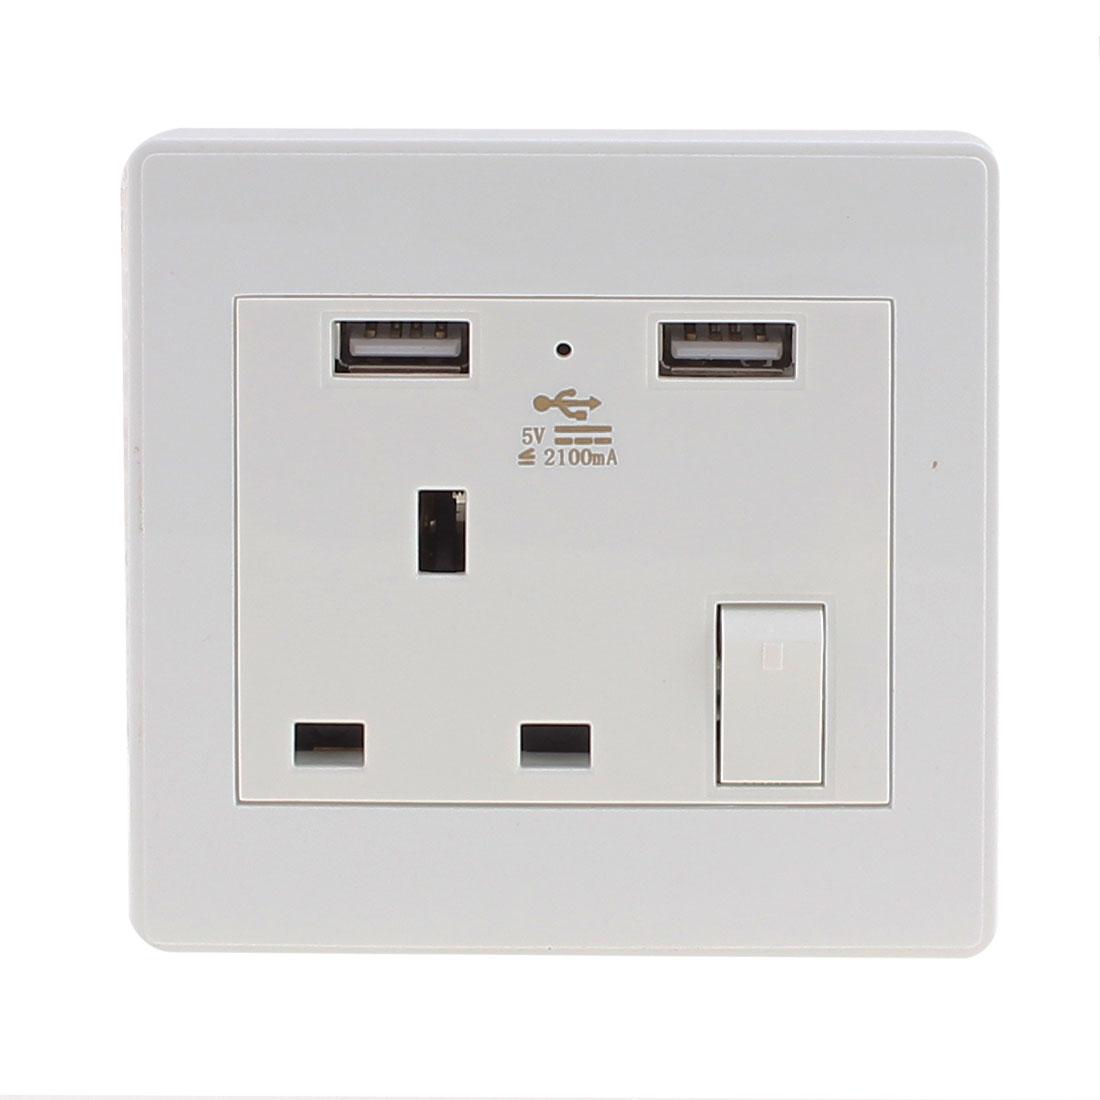 AC 110V-250V UK Socket 2 USB Port 5VDC 2100mA Charger Power LED Lamp Switch Wall Outlet